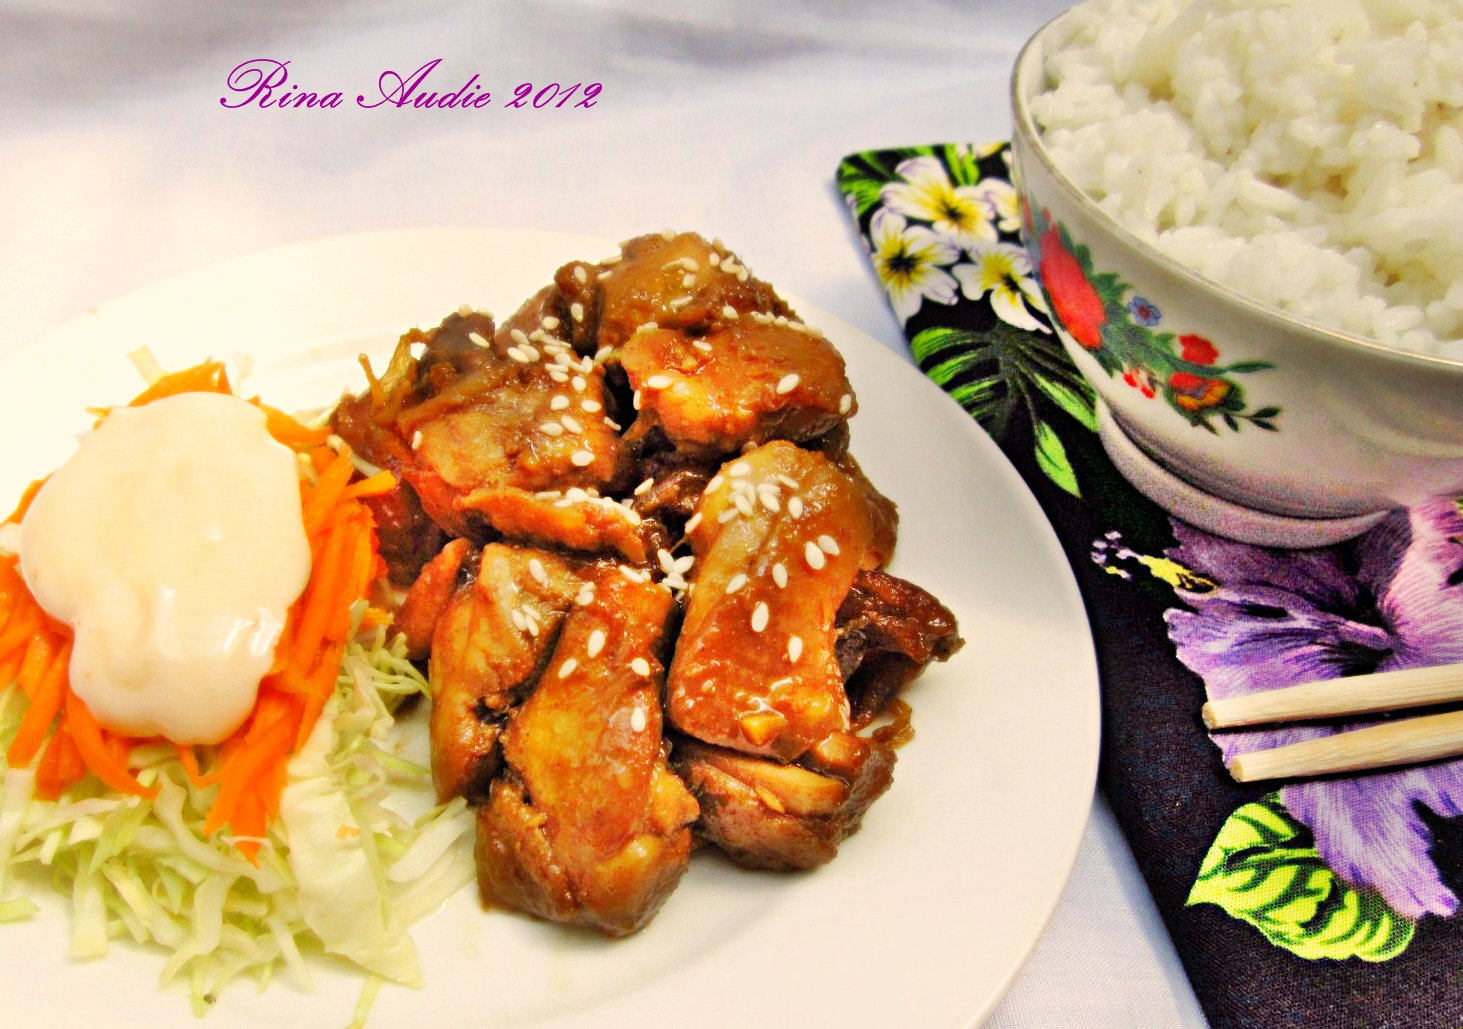 Tumis kol,buncis dan wortel dengan tempe dan bakso saus tiram